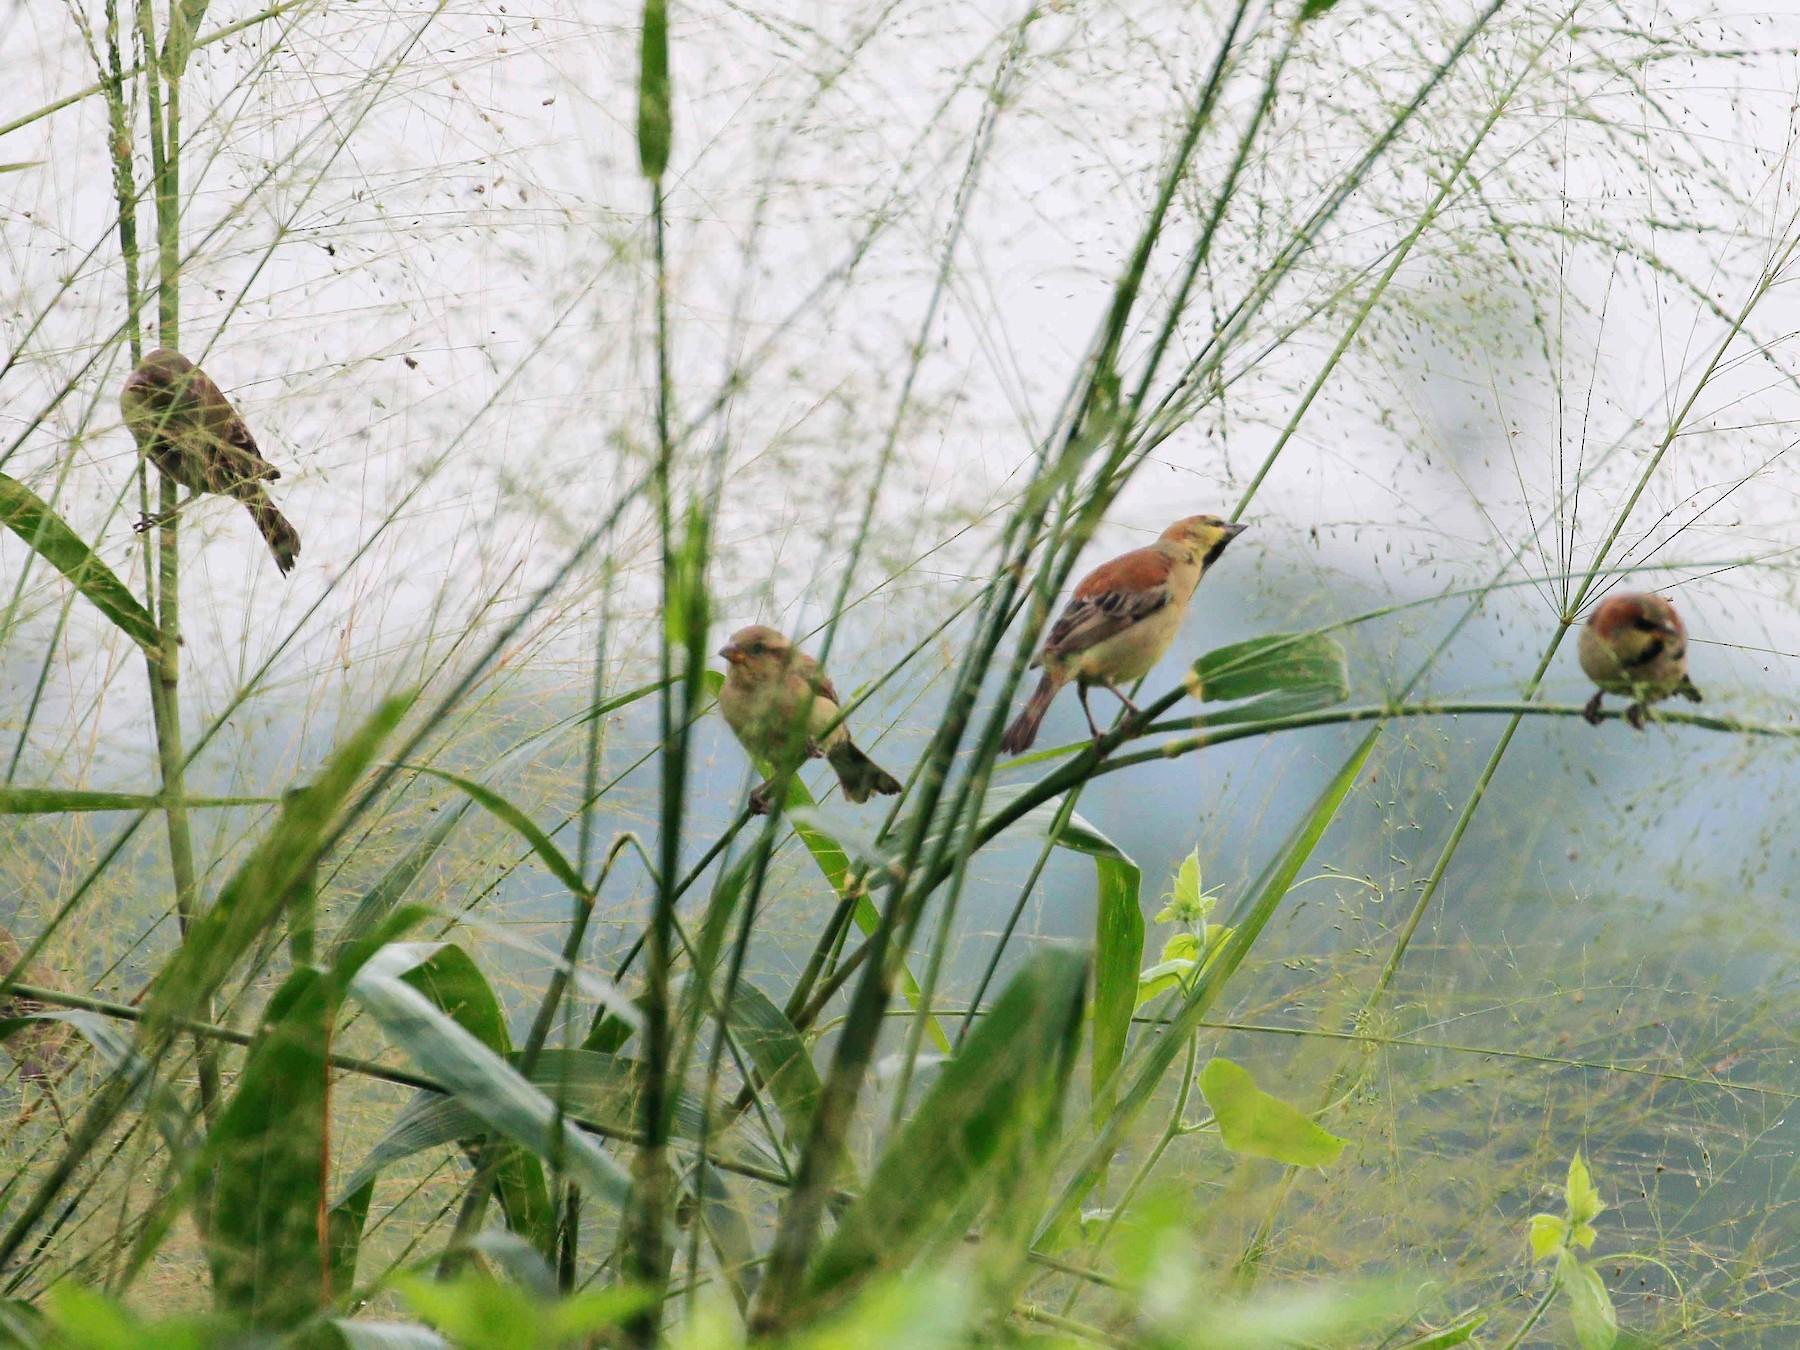 Plain-backed Sparrow - Neoh Hor Kee